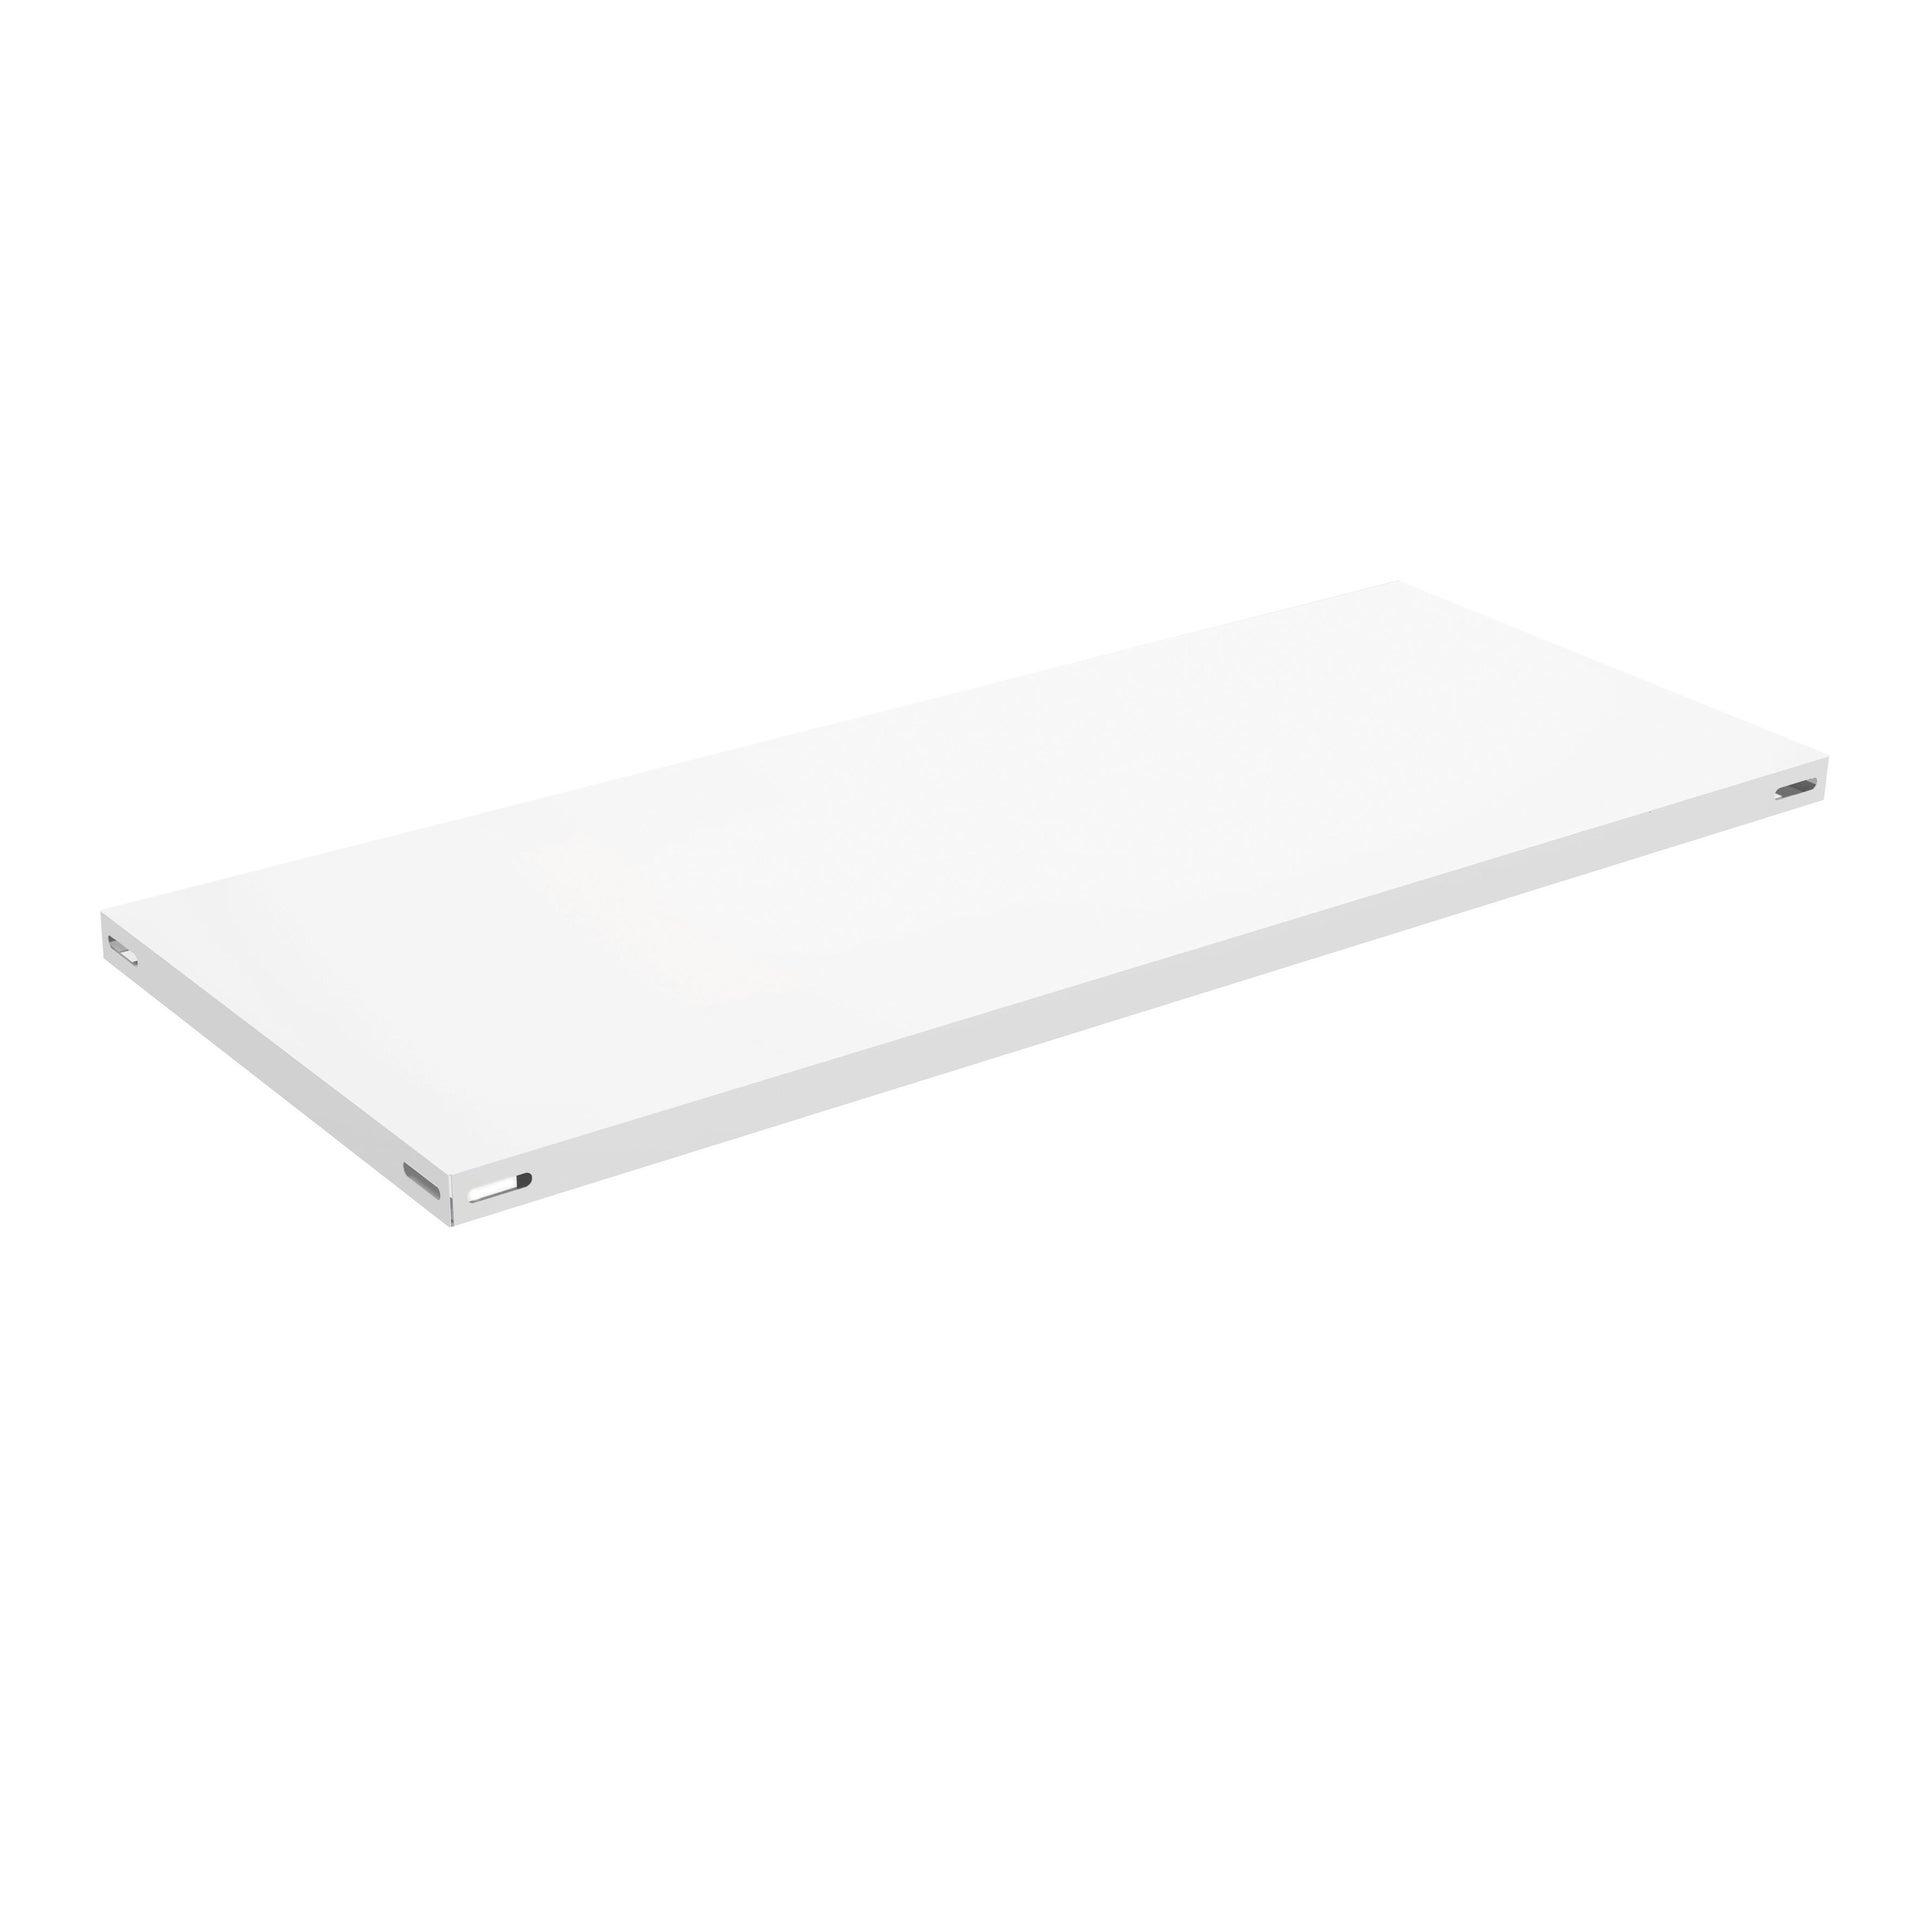 Ripiano L 80 x H 3 x P 30 cm bianco